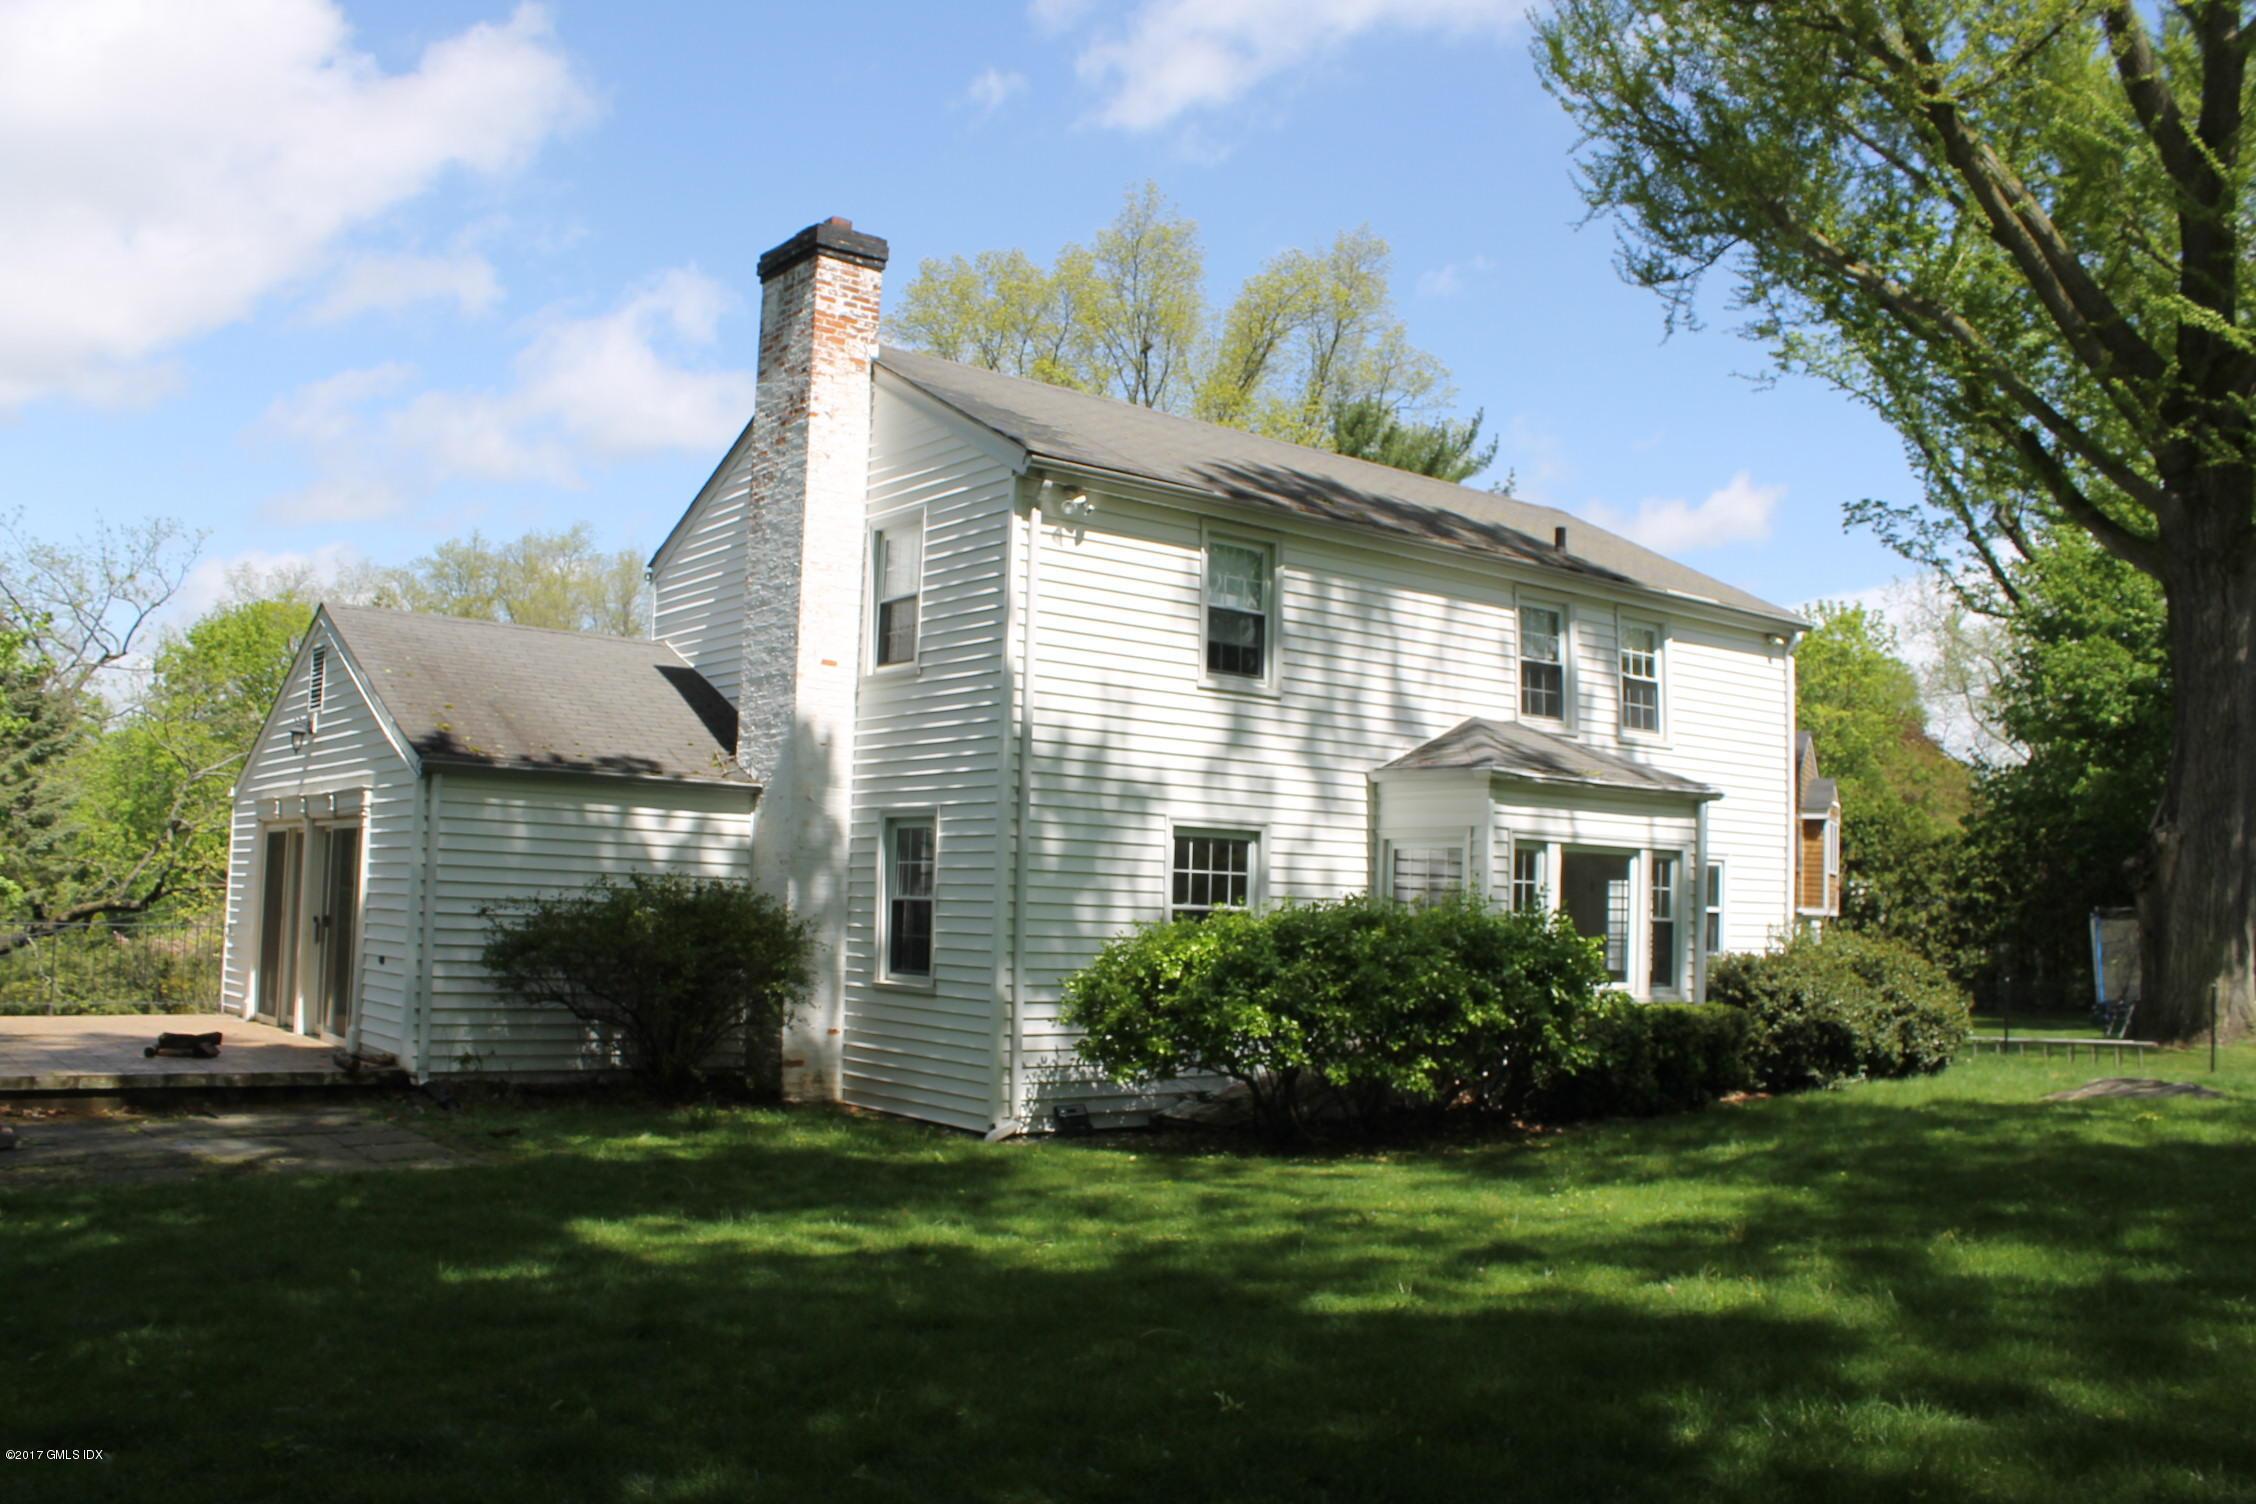 14 Pierce Road,Riverside,Connecticut 06878,3 Bedrooms Bedrooms,2 BathroomsBathrooms,Single family,Pierce,106678